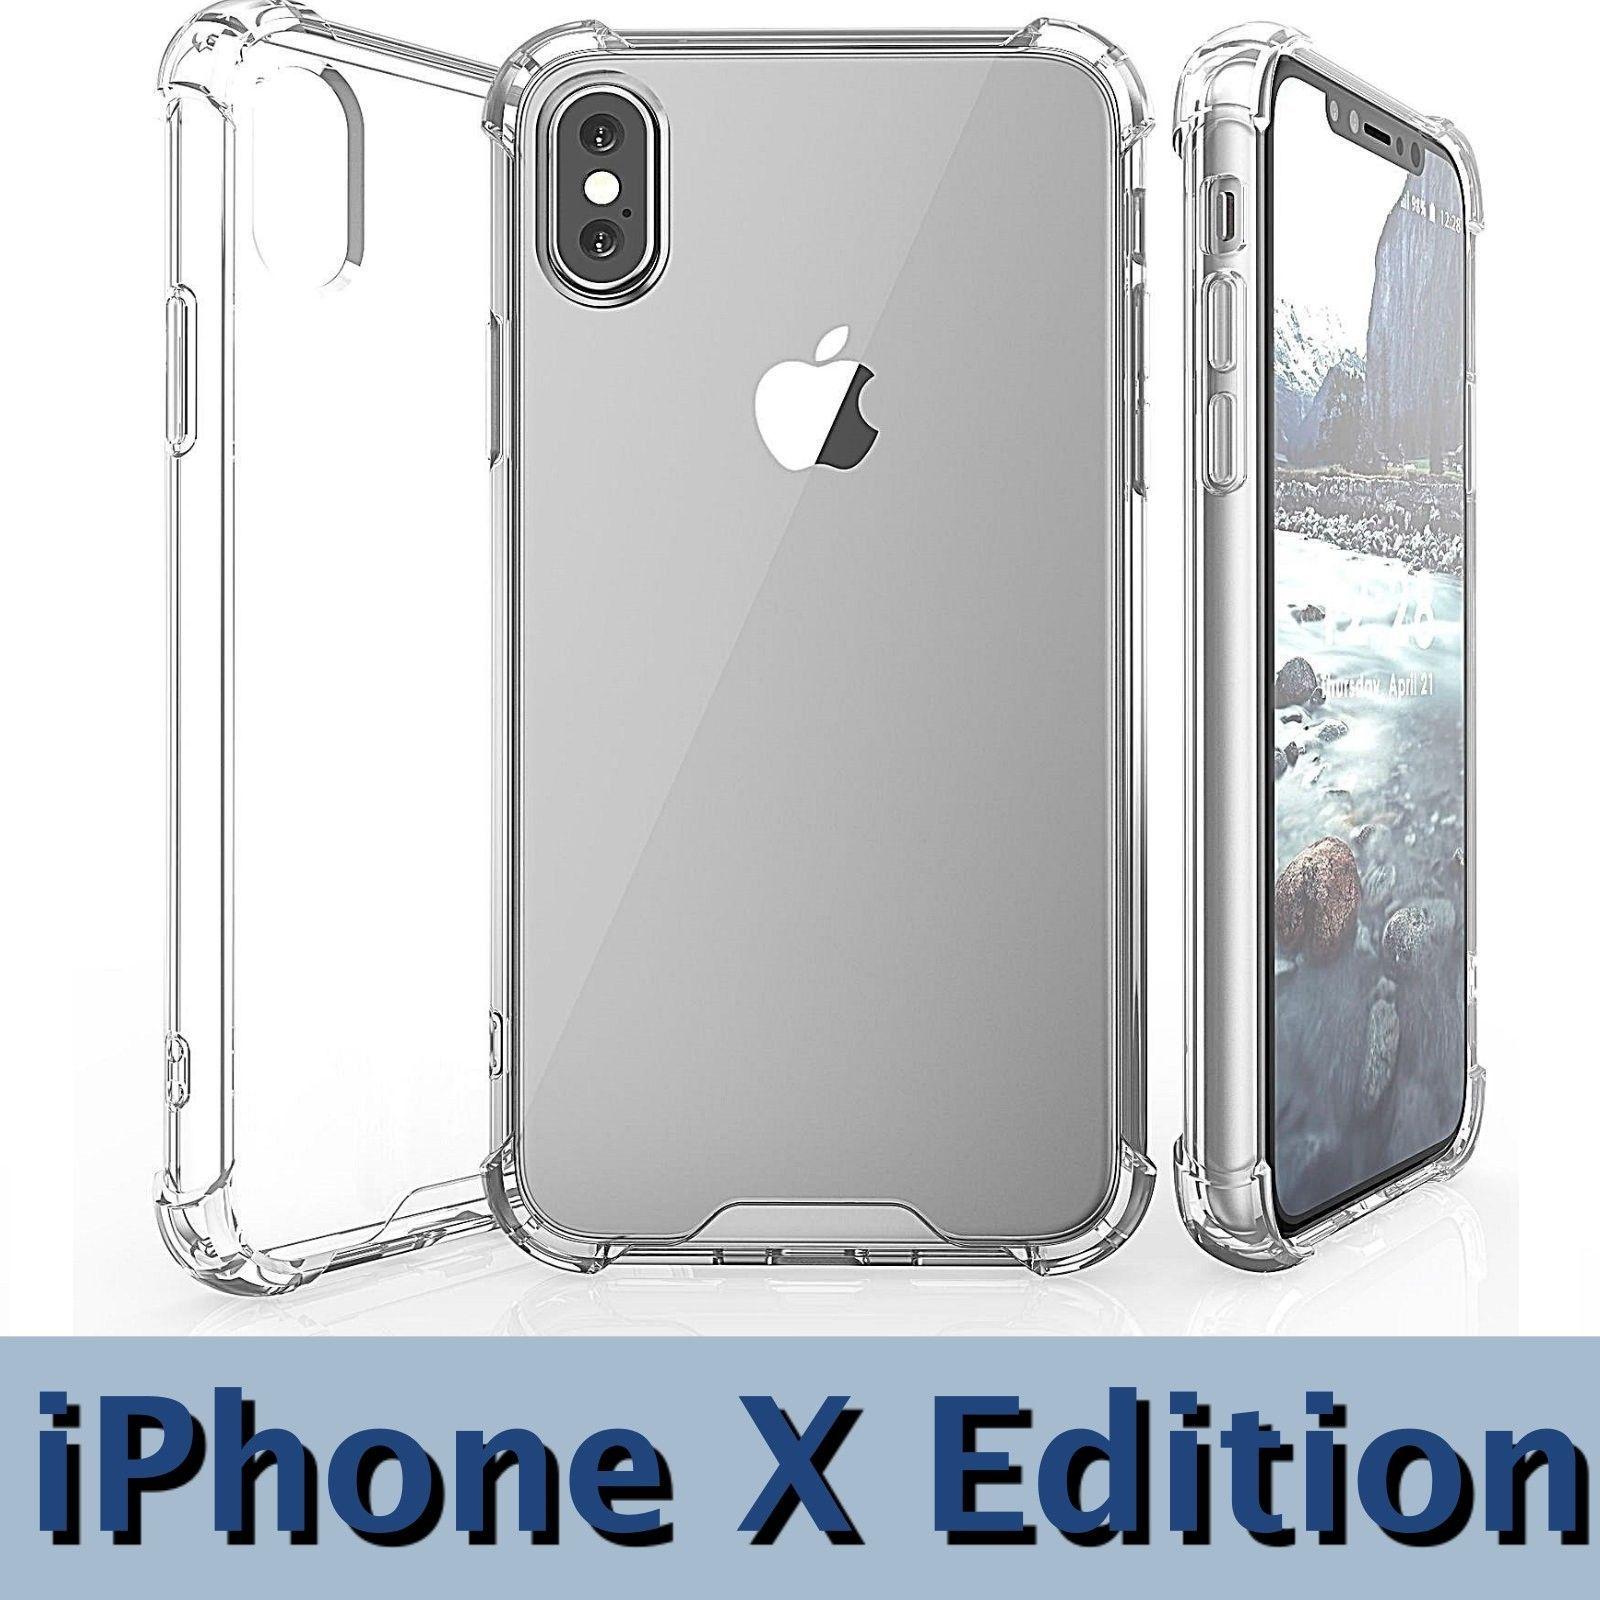 Günstige Handyhüllen Neue Ankunft Iphone X Edition Fall Bumper Antislip Antiscratch Cover Für Iphone 10 Hd Clear Schutz Weichen Handy Fall Silikon